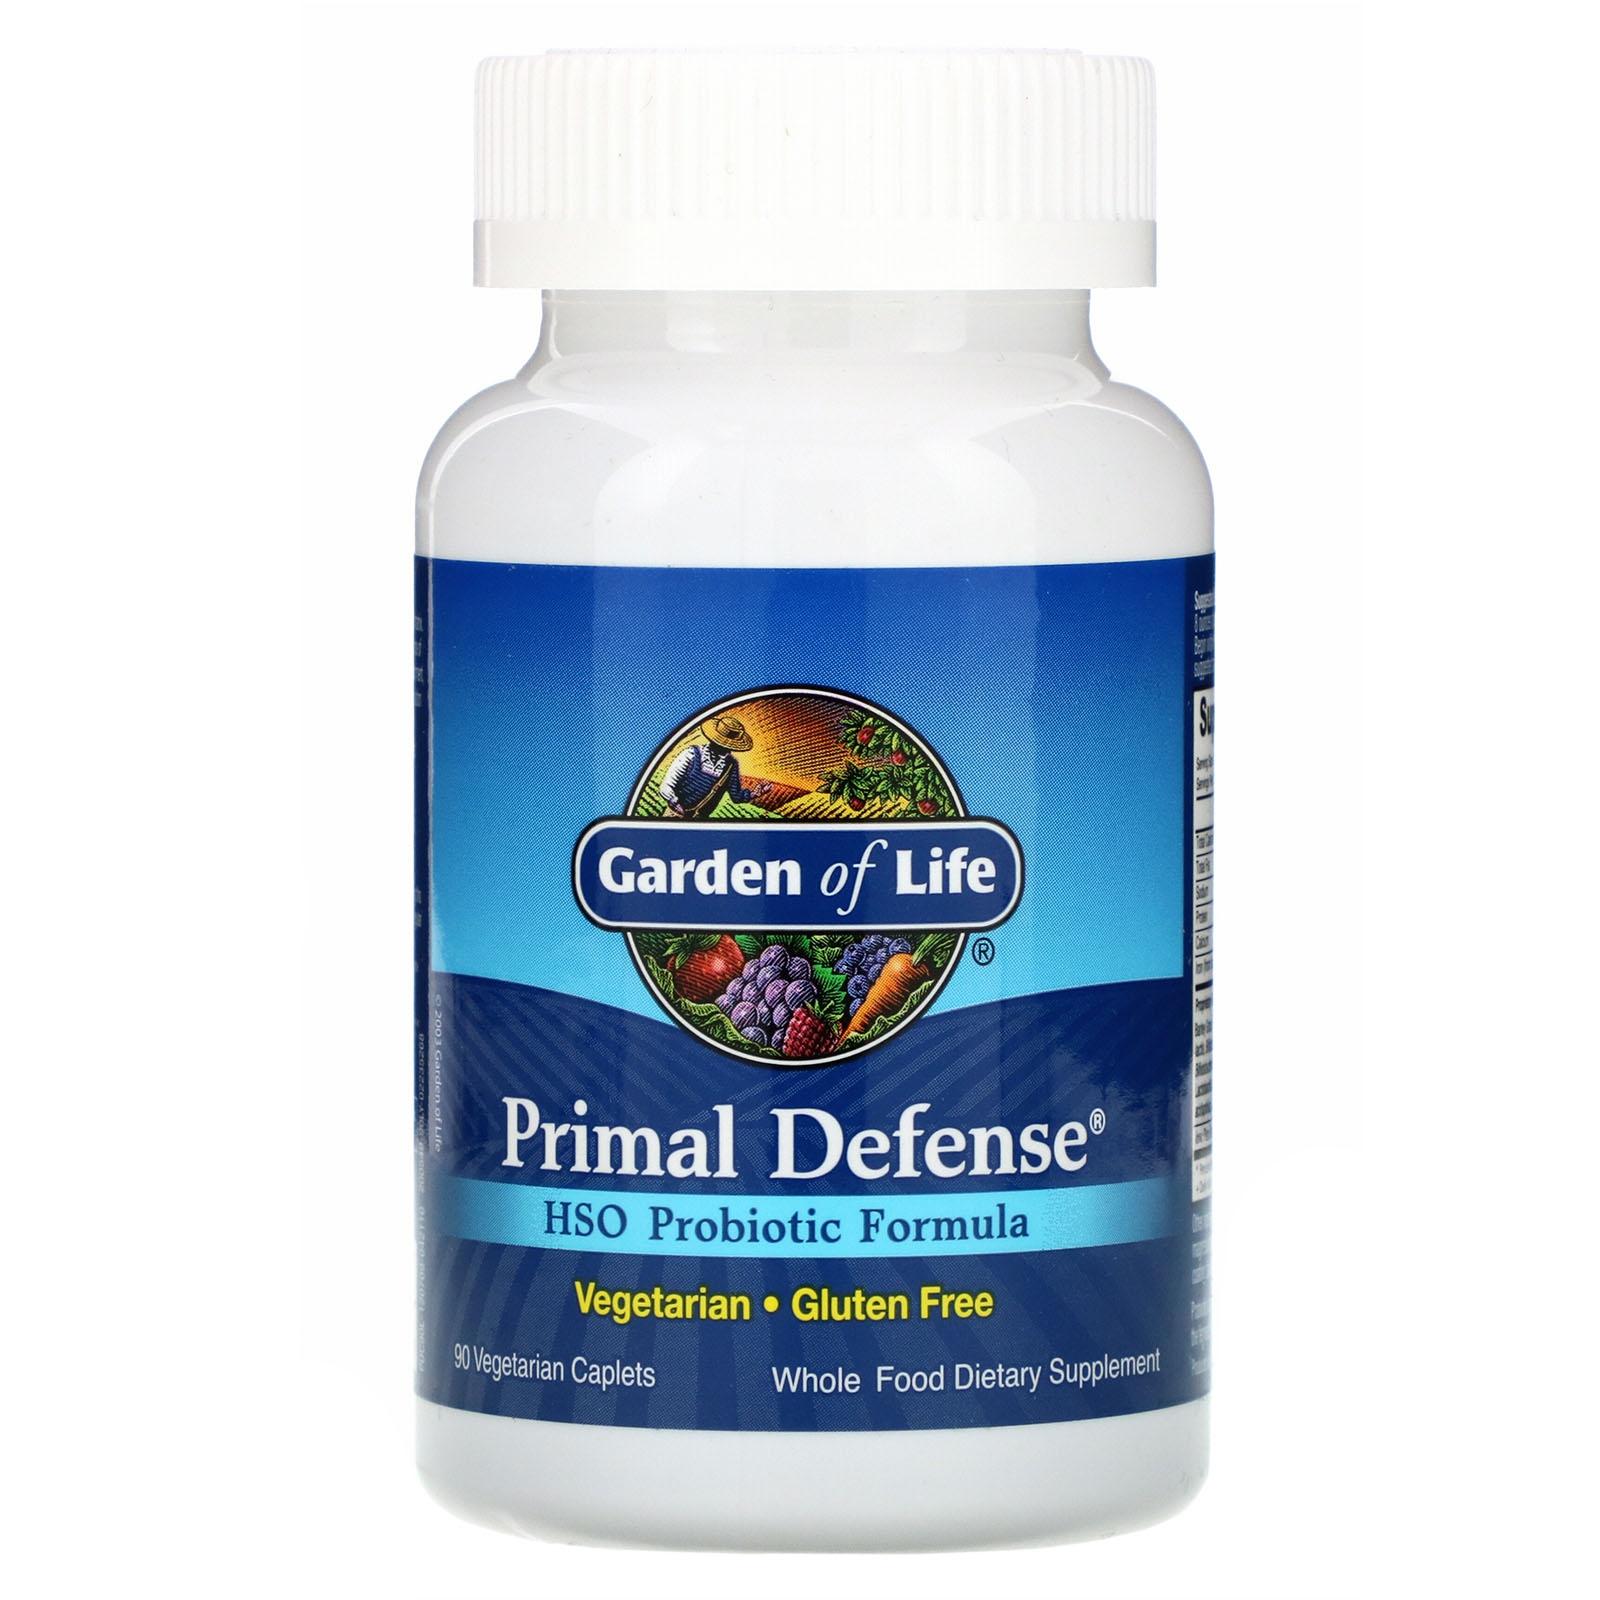 Image of Primal Defense- HSO Probiotic Formula (90 caplet) - Garden of Life 0658010111119